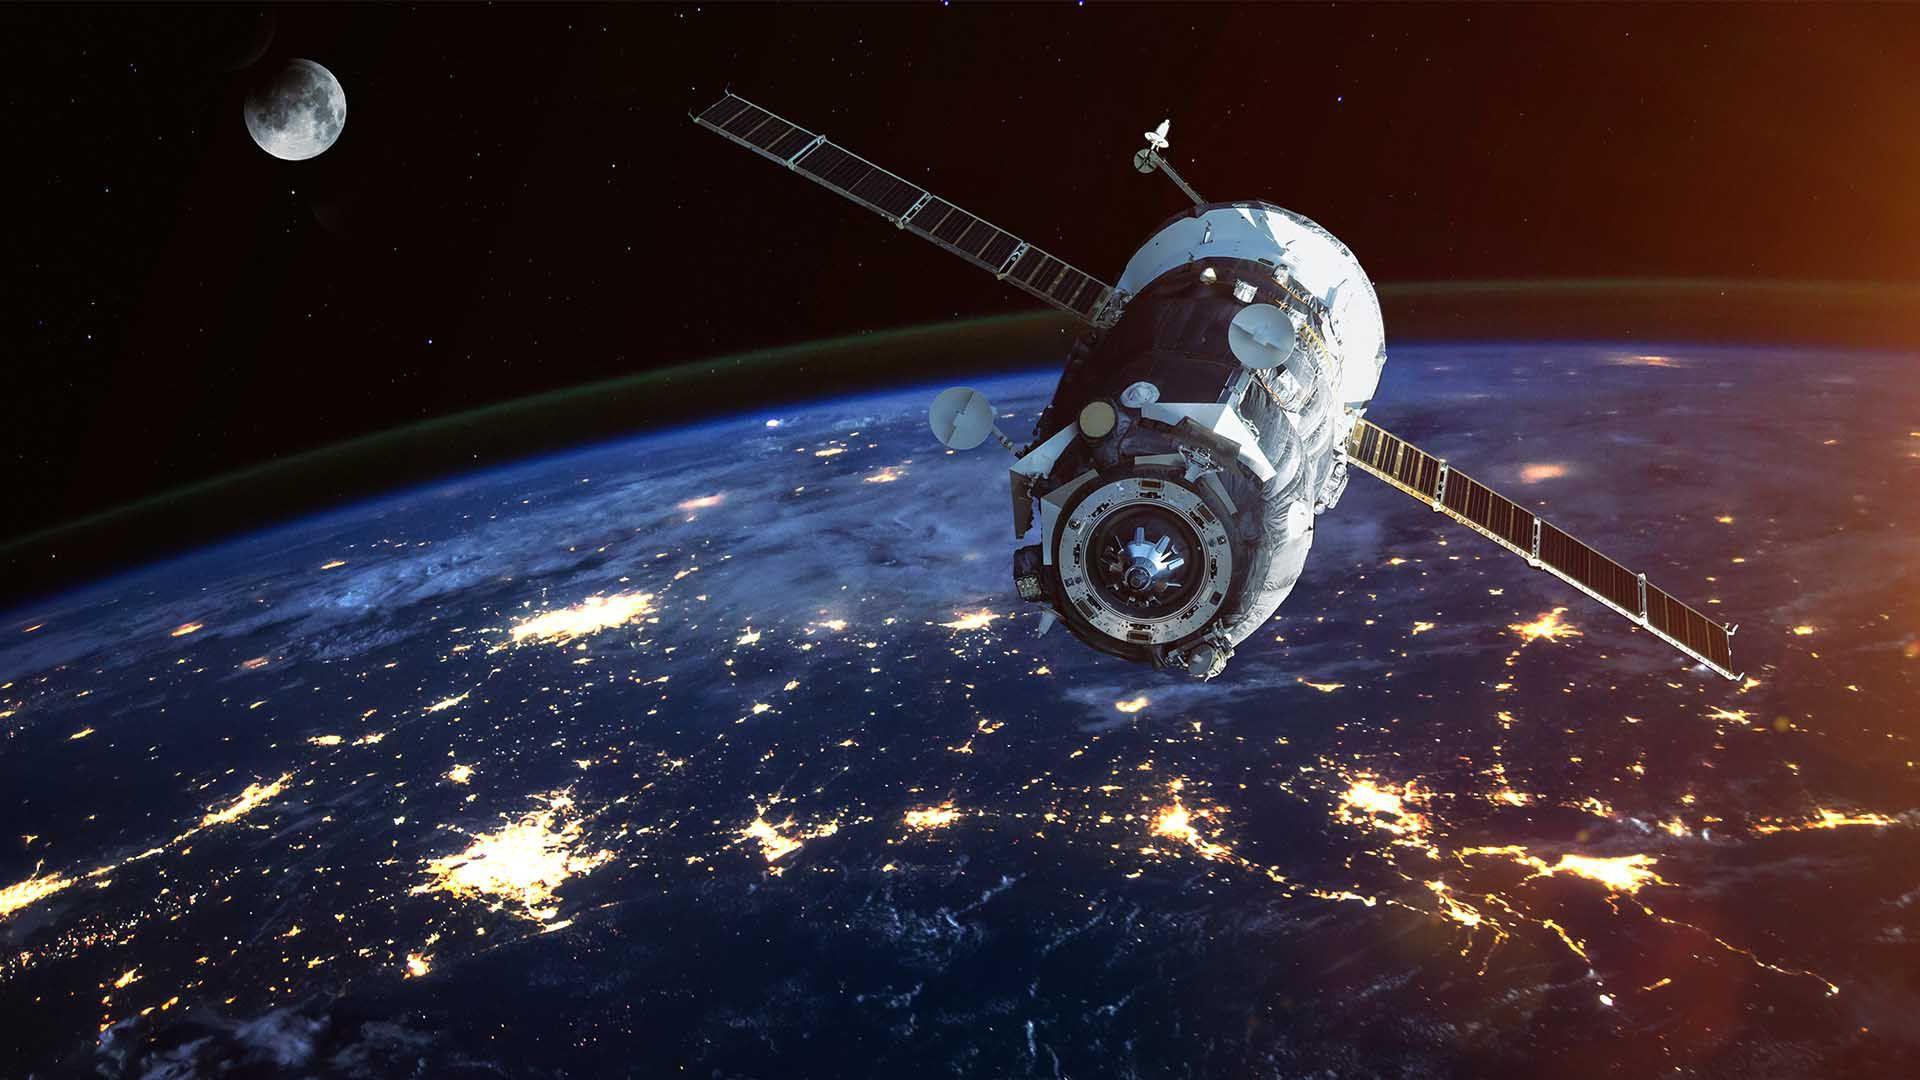 vesmir rusko militarizovat zbrane amerika americania rusi satelity raketa